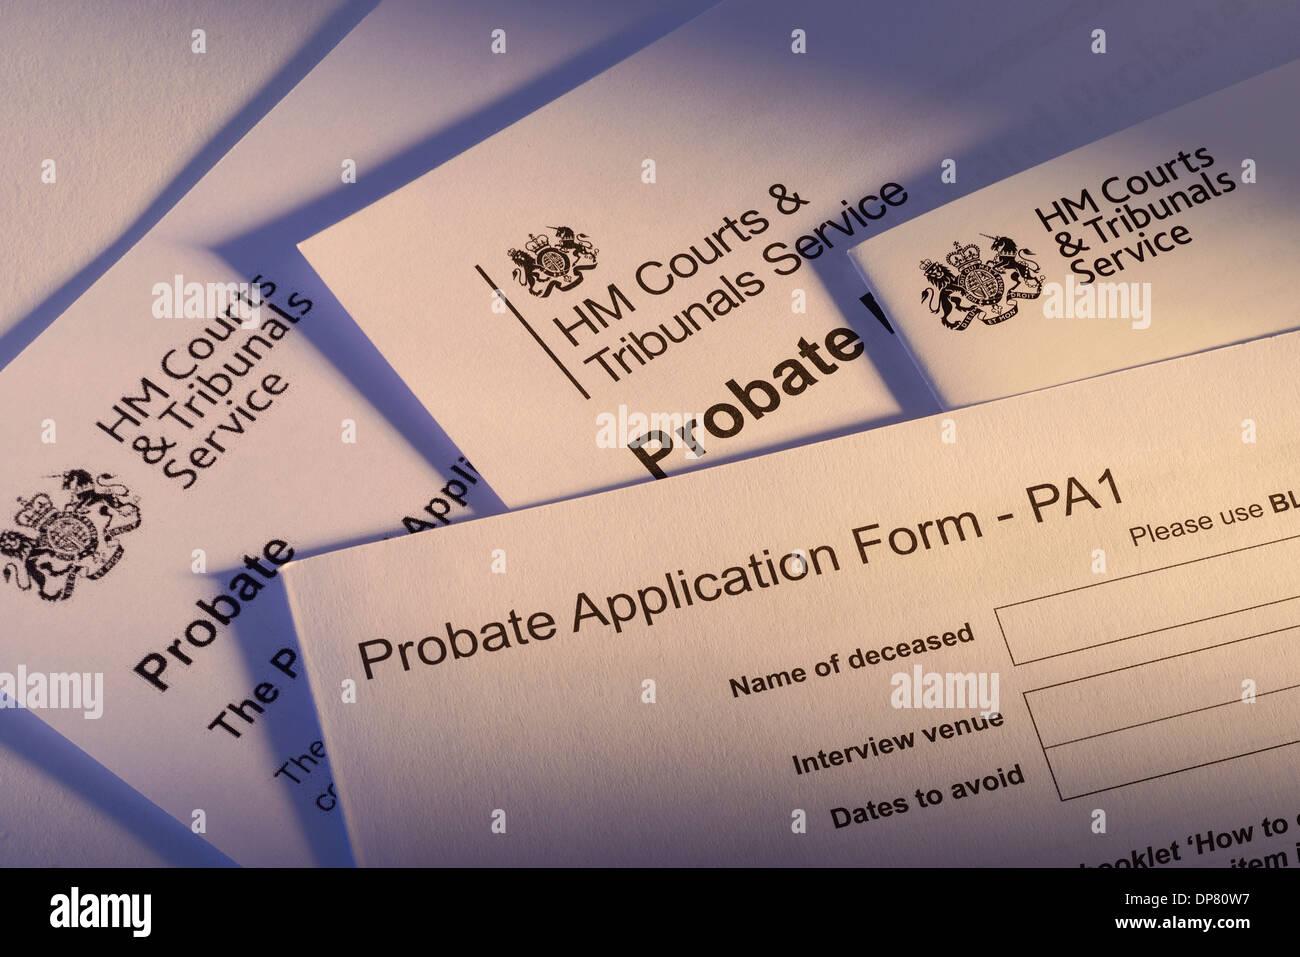 german passport renewal application form